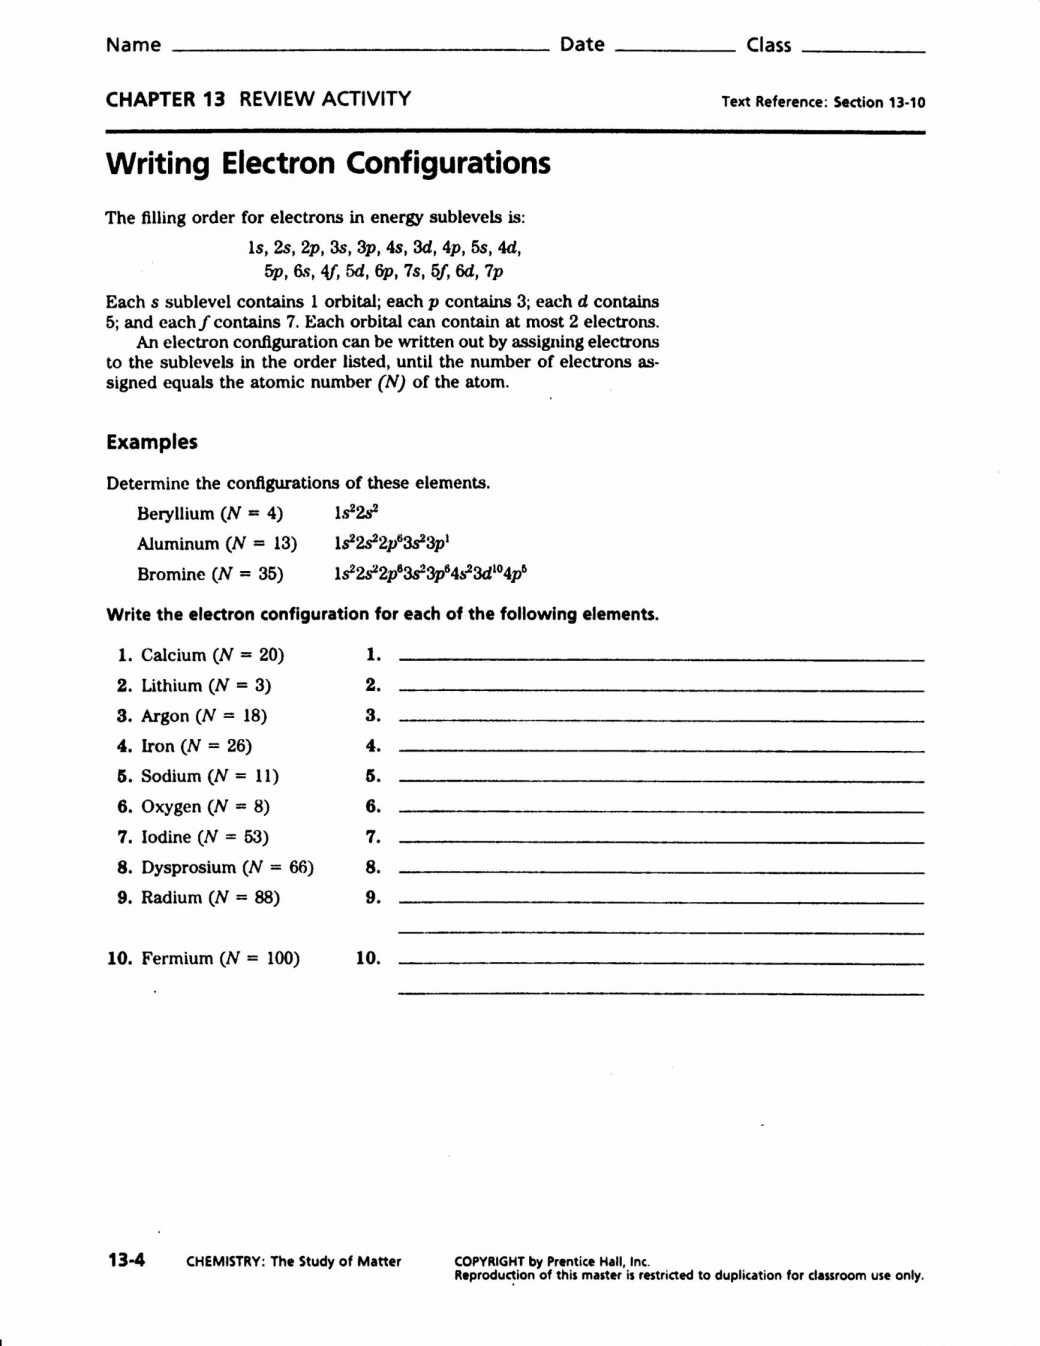 Physical Vs Chemical Changes Worksheet Lovely Worksheet 2 Physical Chemical Properties Changes